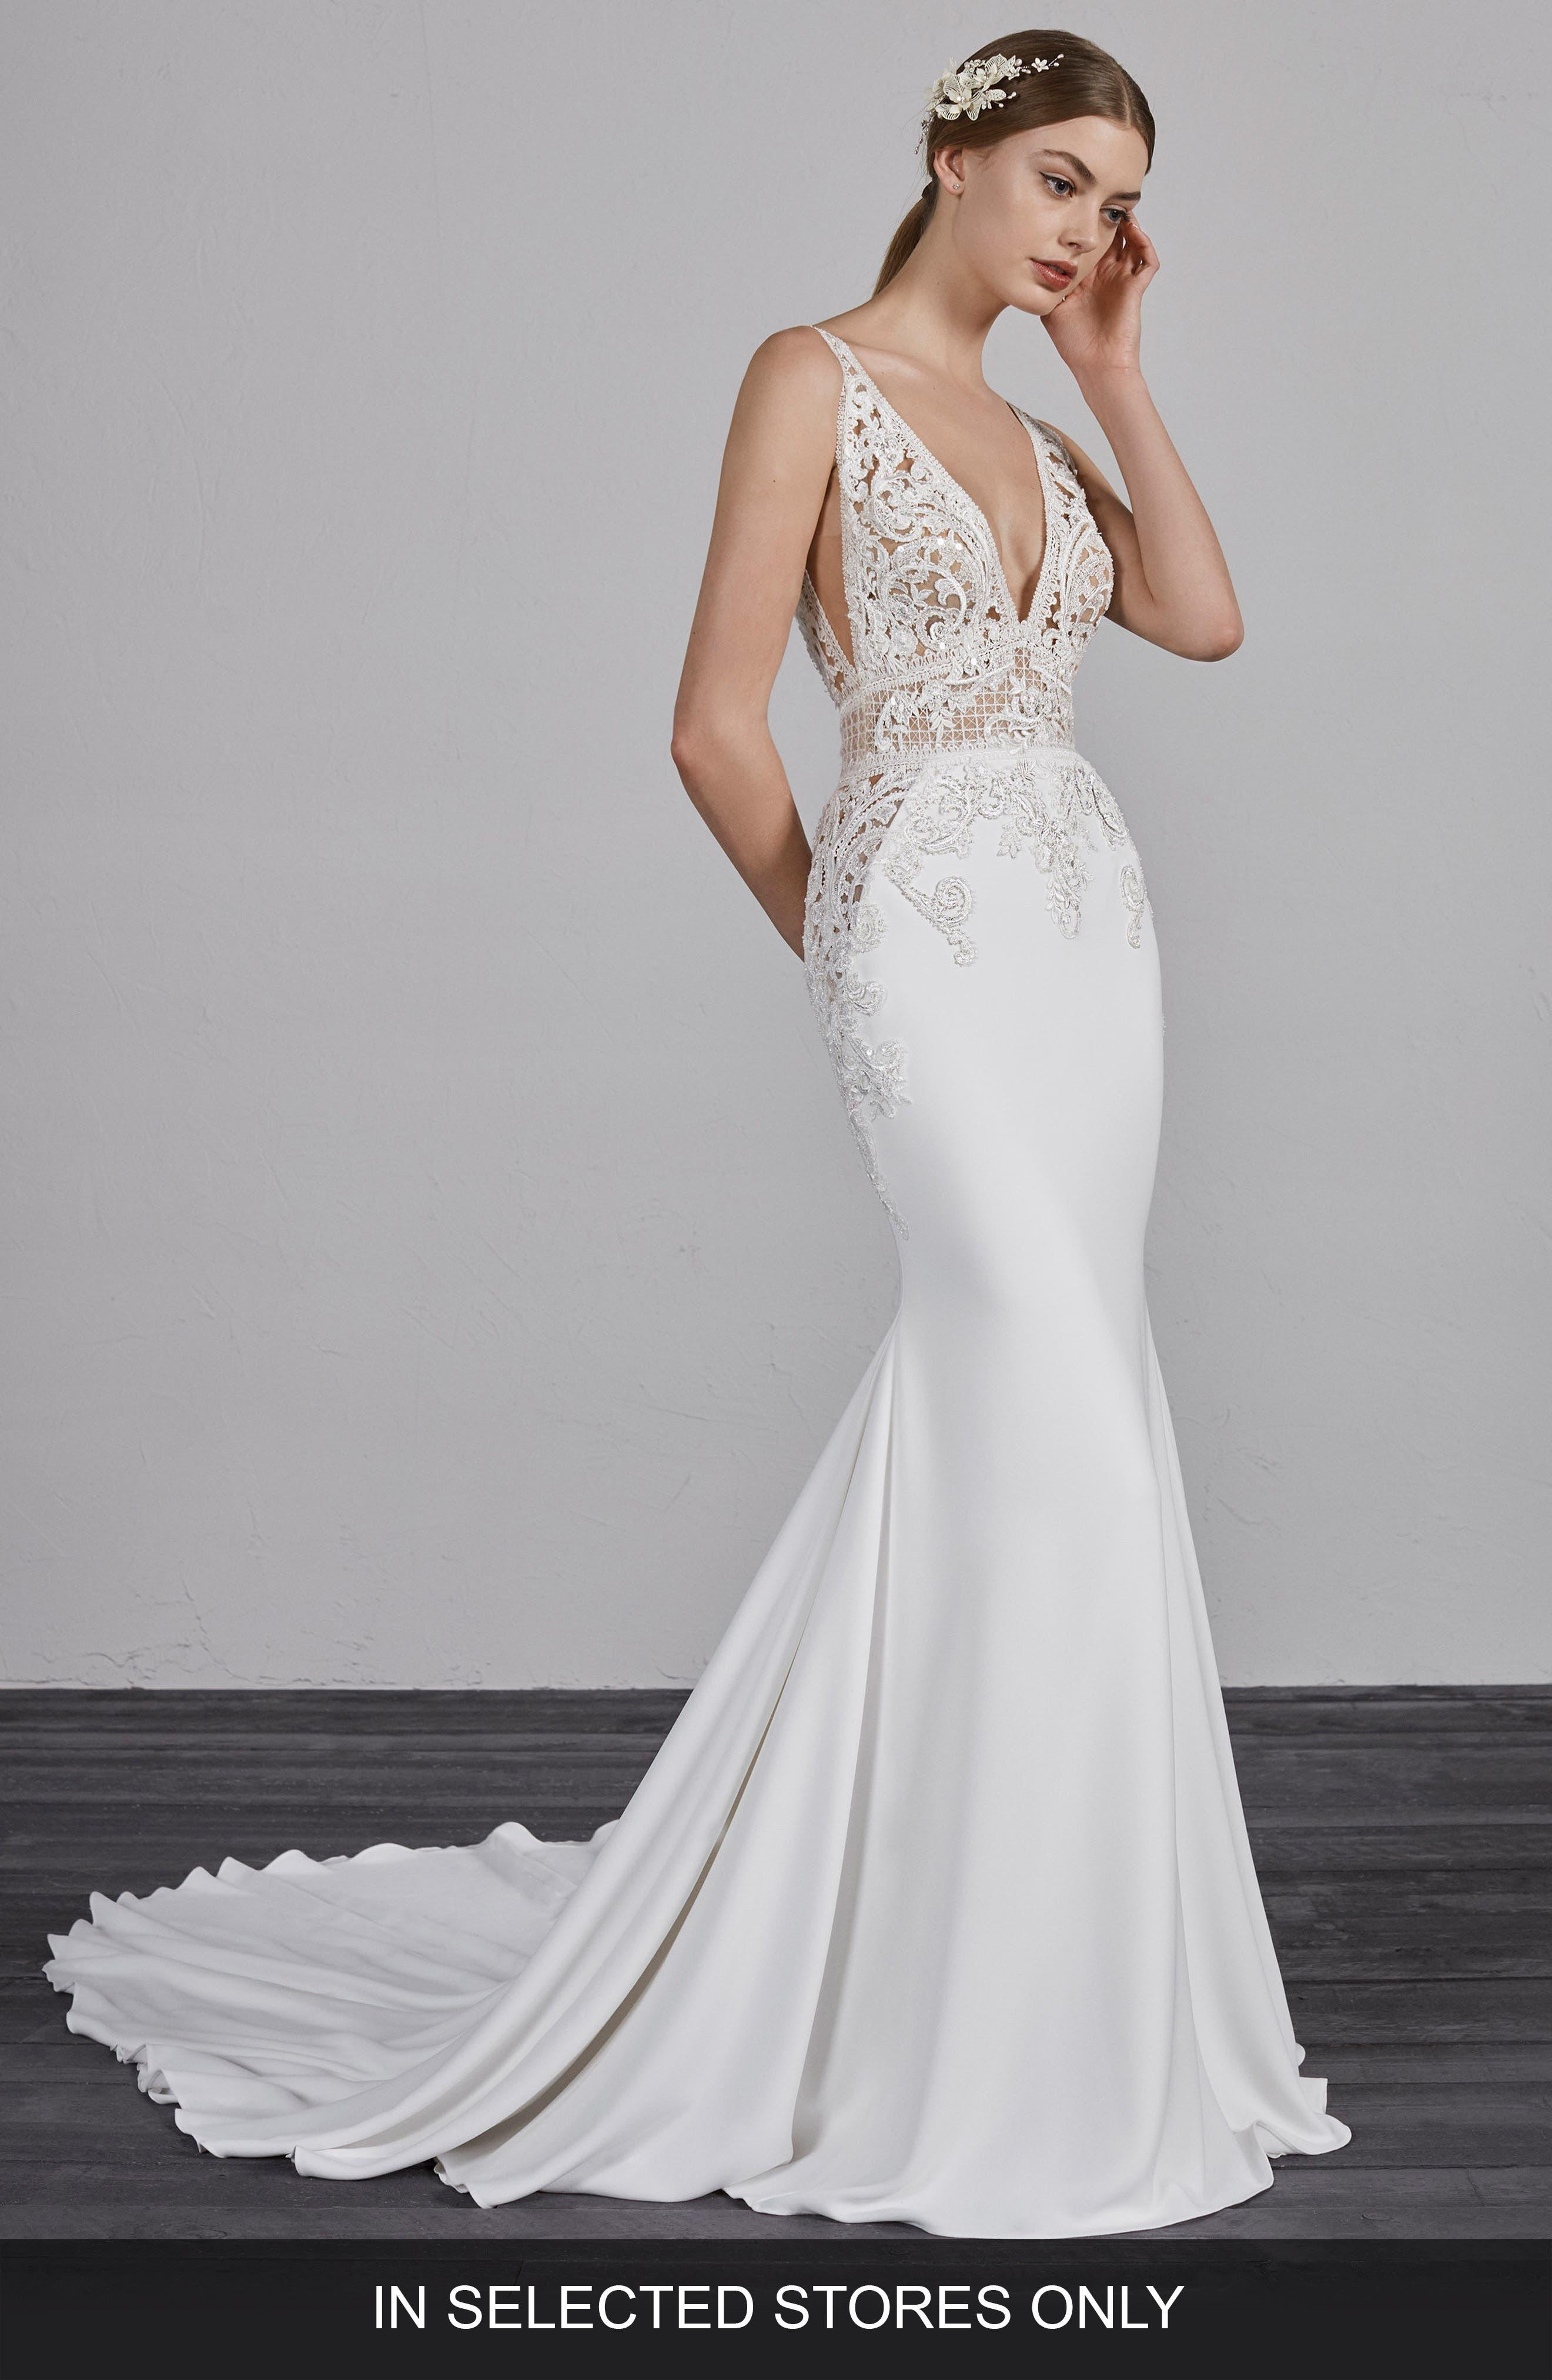 pronovias wedding dress nordstrom off 18   medpharmres.com